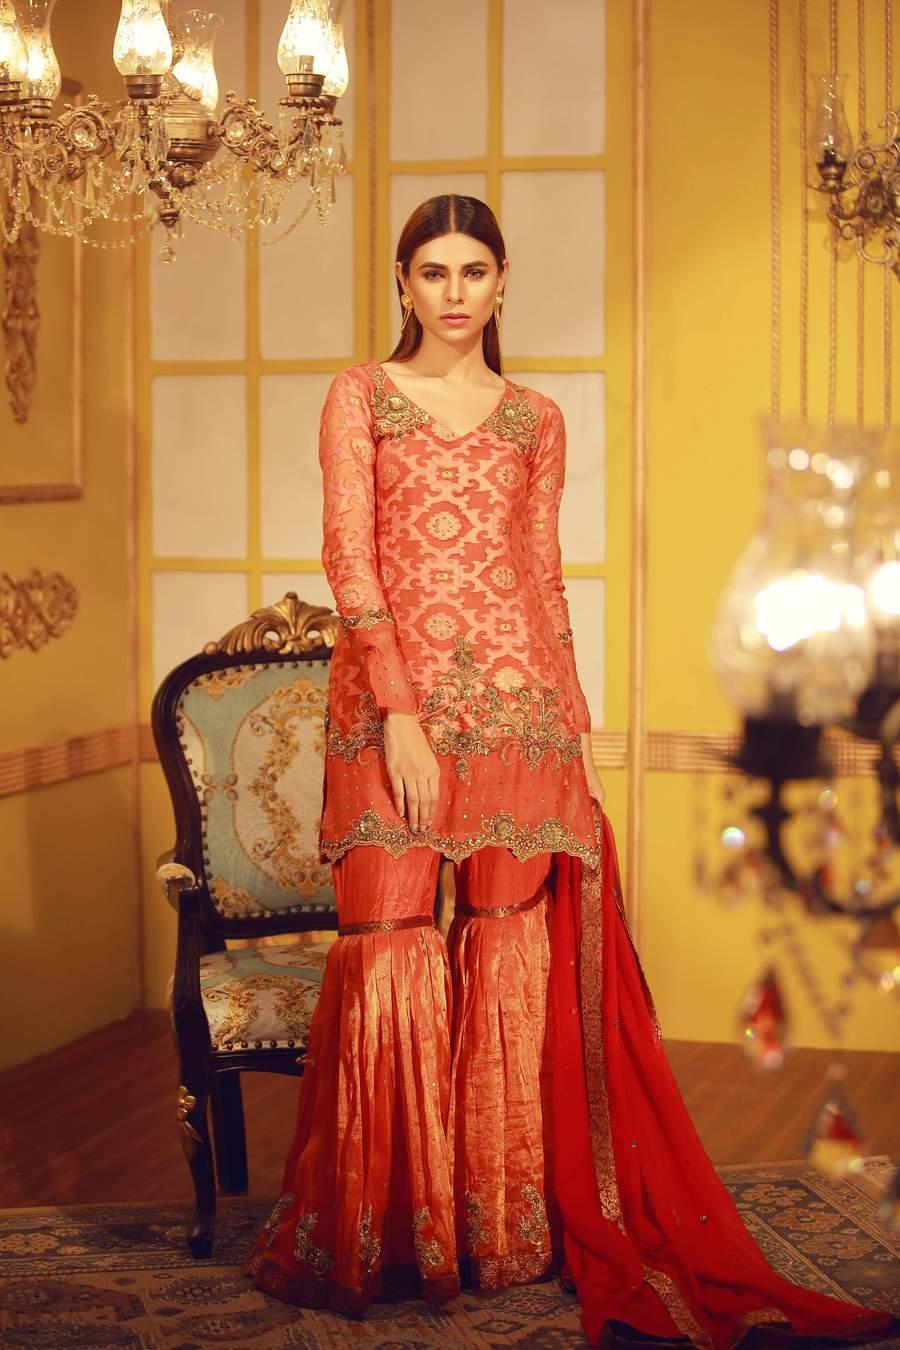 Pure self & zari organza Mehndi outfit with zardozi work,paired with maysuri gharara pants with zardozi motifs